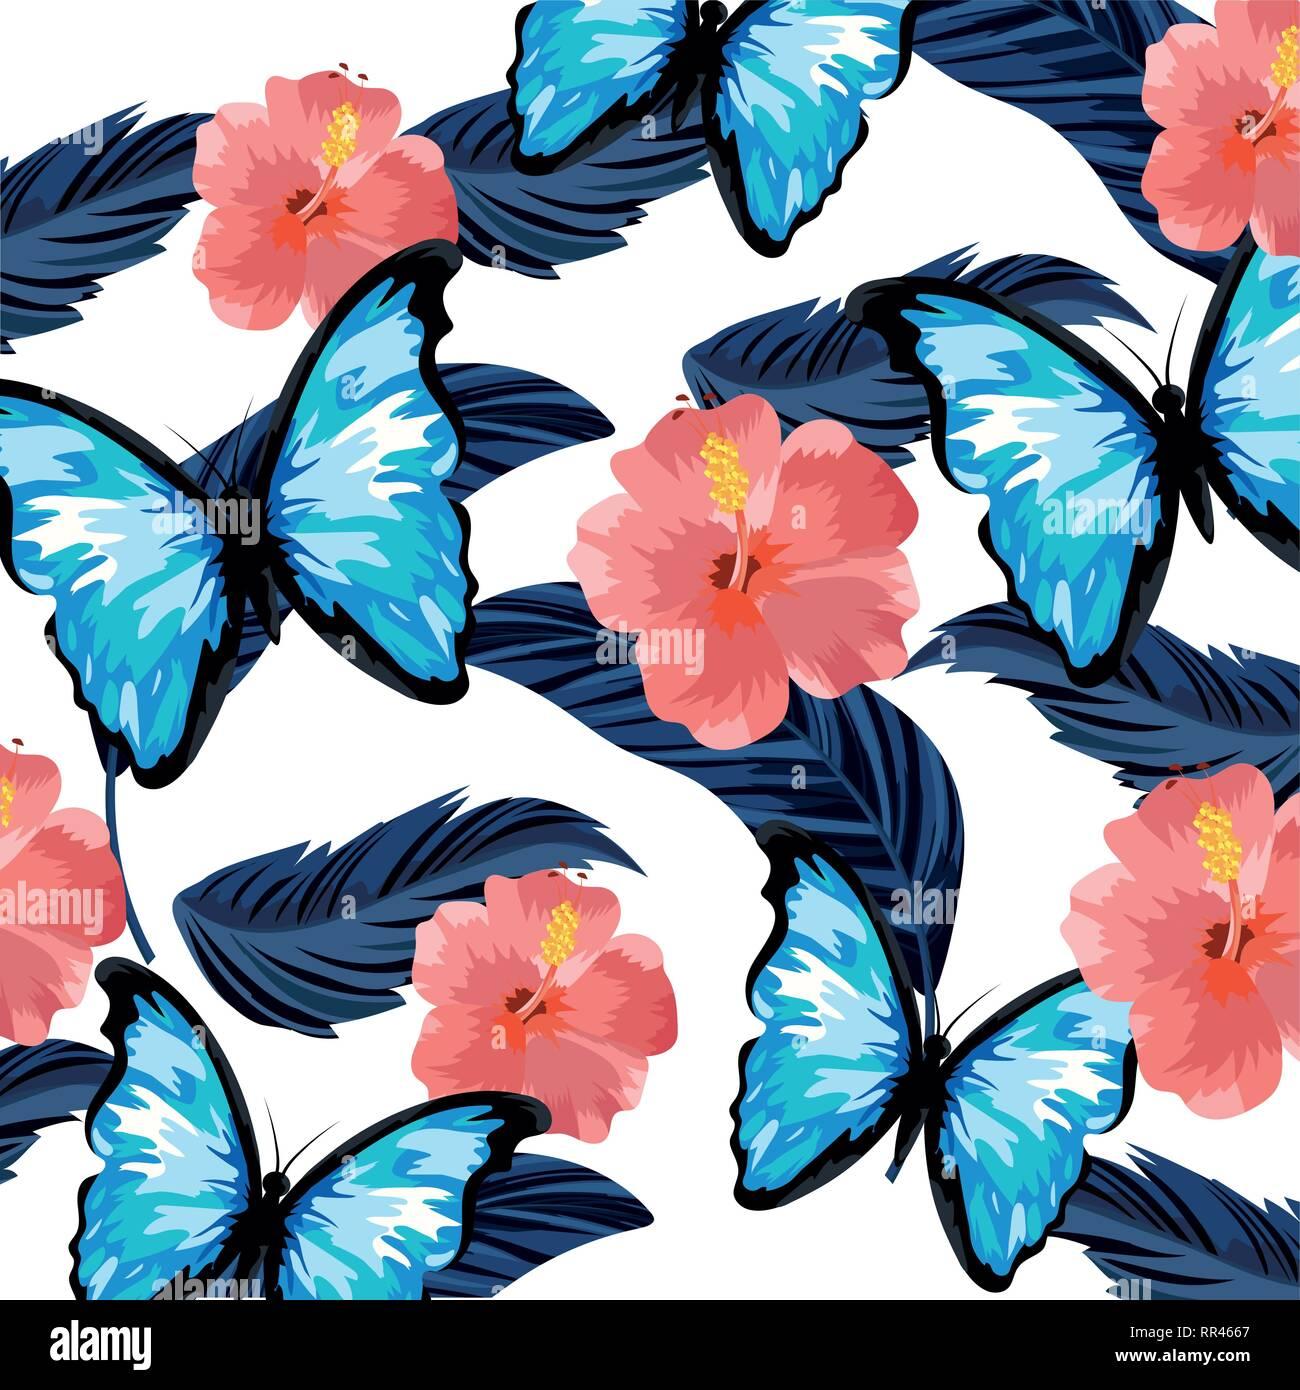 beautiful tropical flowers cartoon - Stock Image